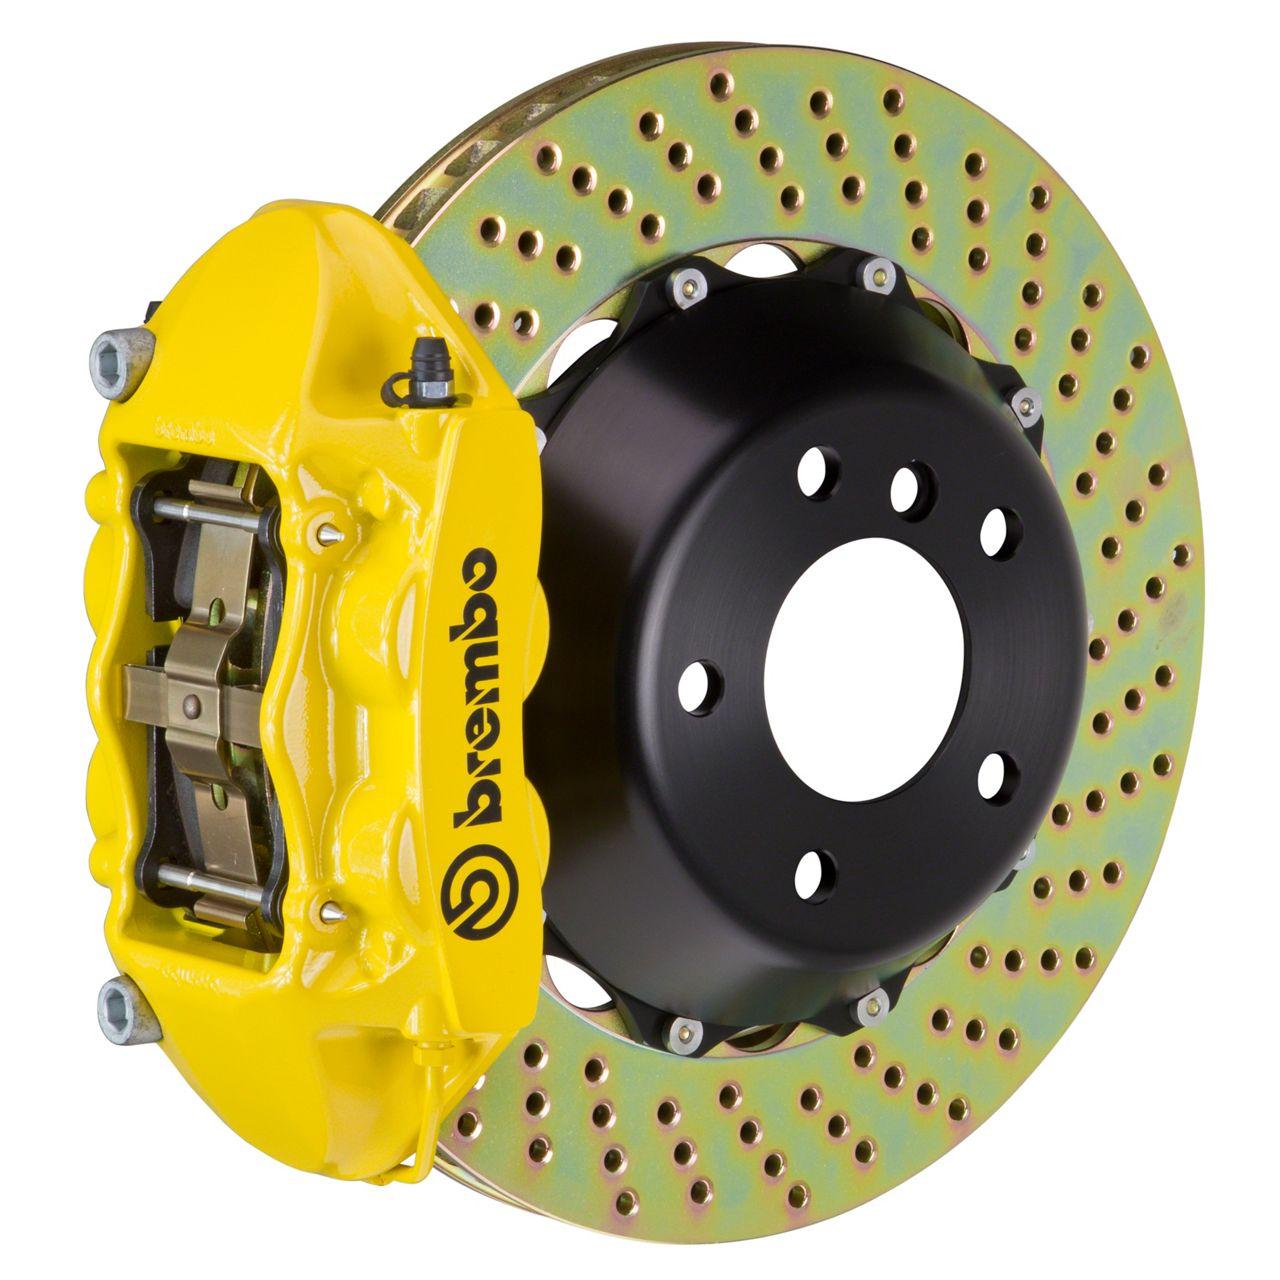 Brembo GT Series 4-Piston Rear Big Brake Kit - 15 in. 2-Piece Cross-Drilled Rotors - Yellow (08-14 SRT8)